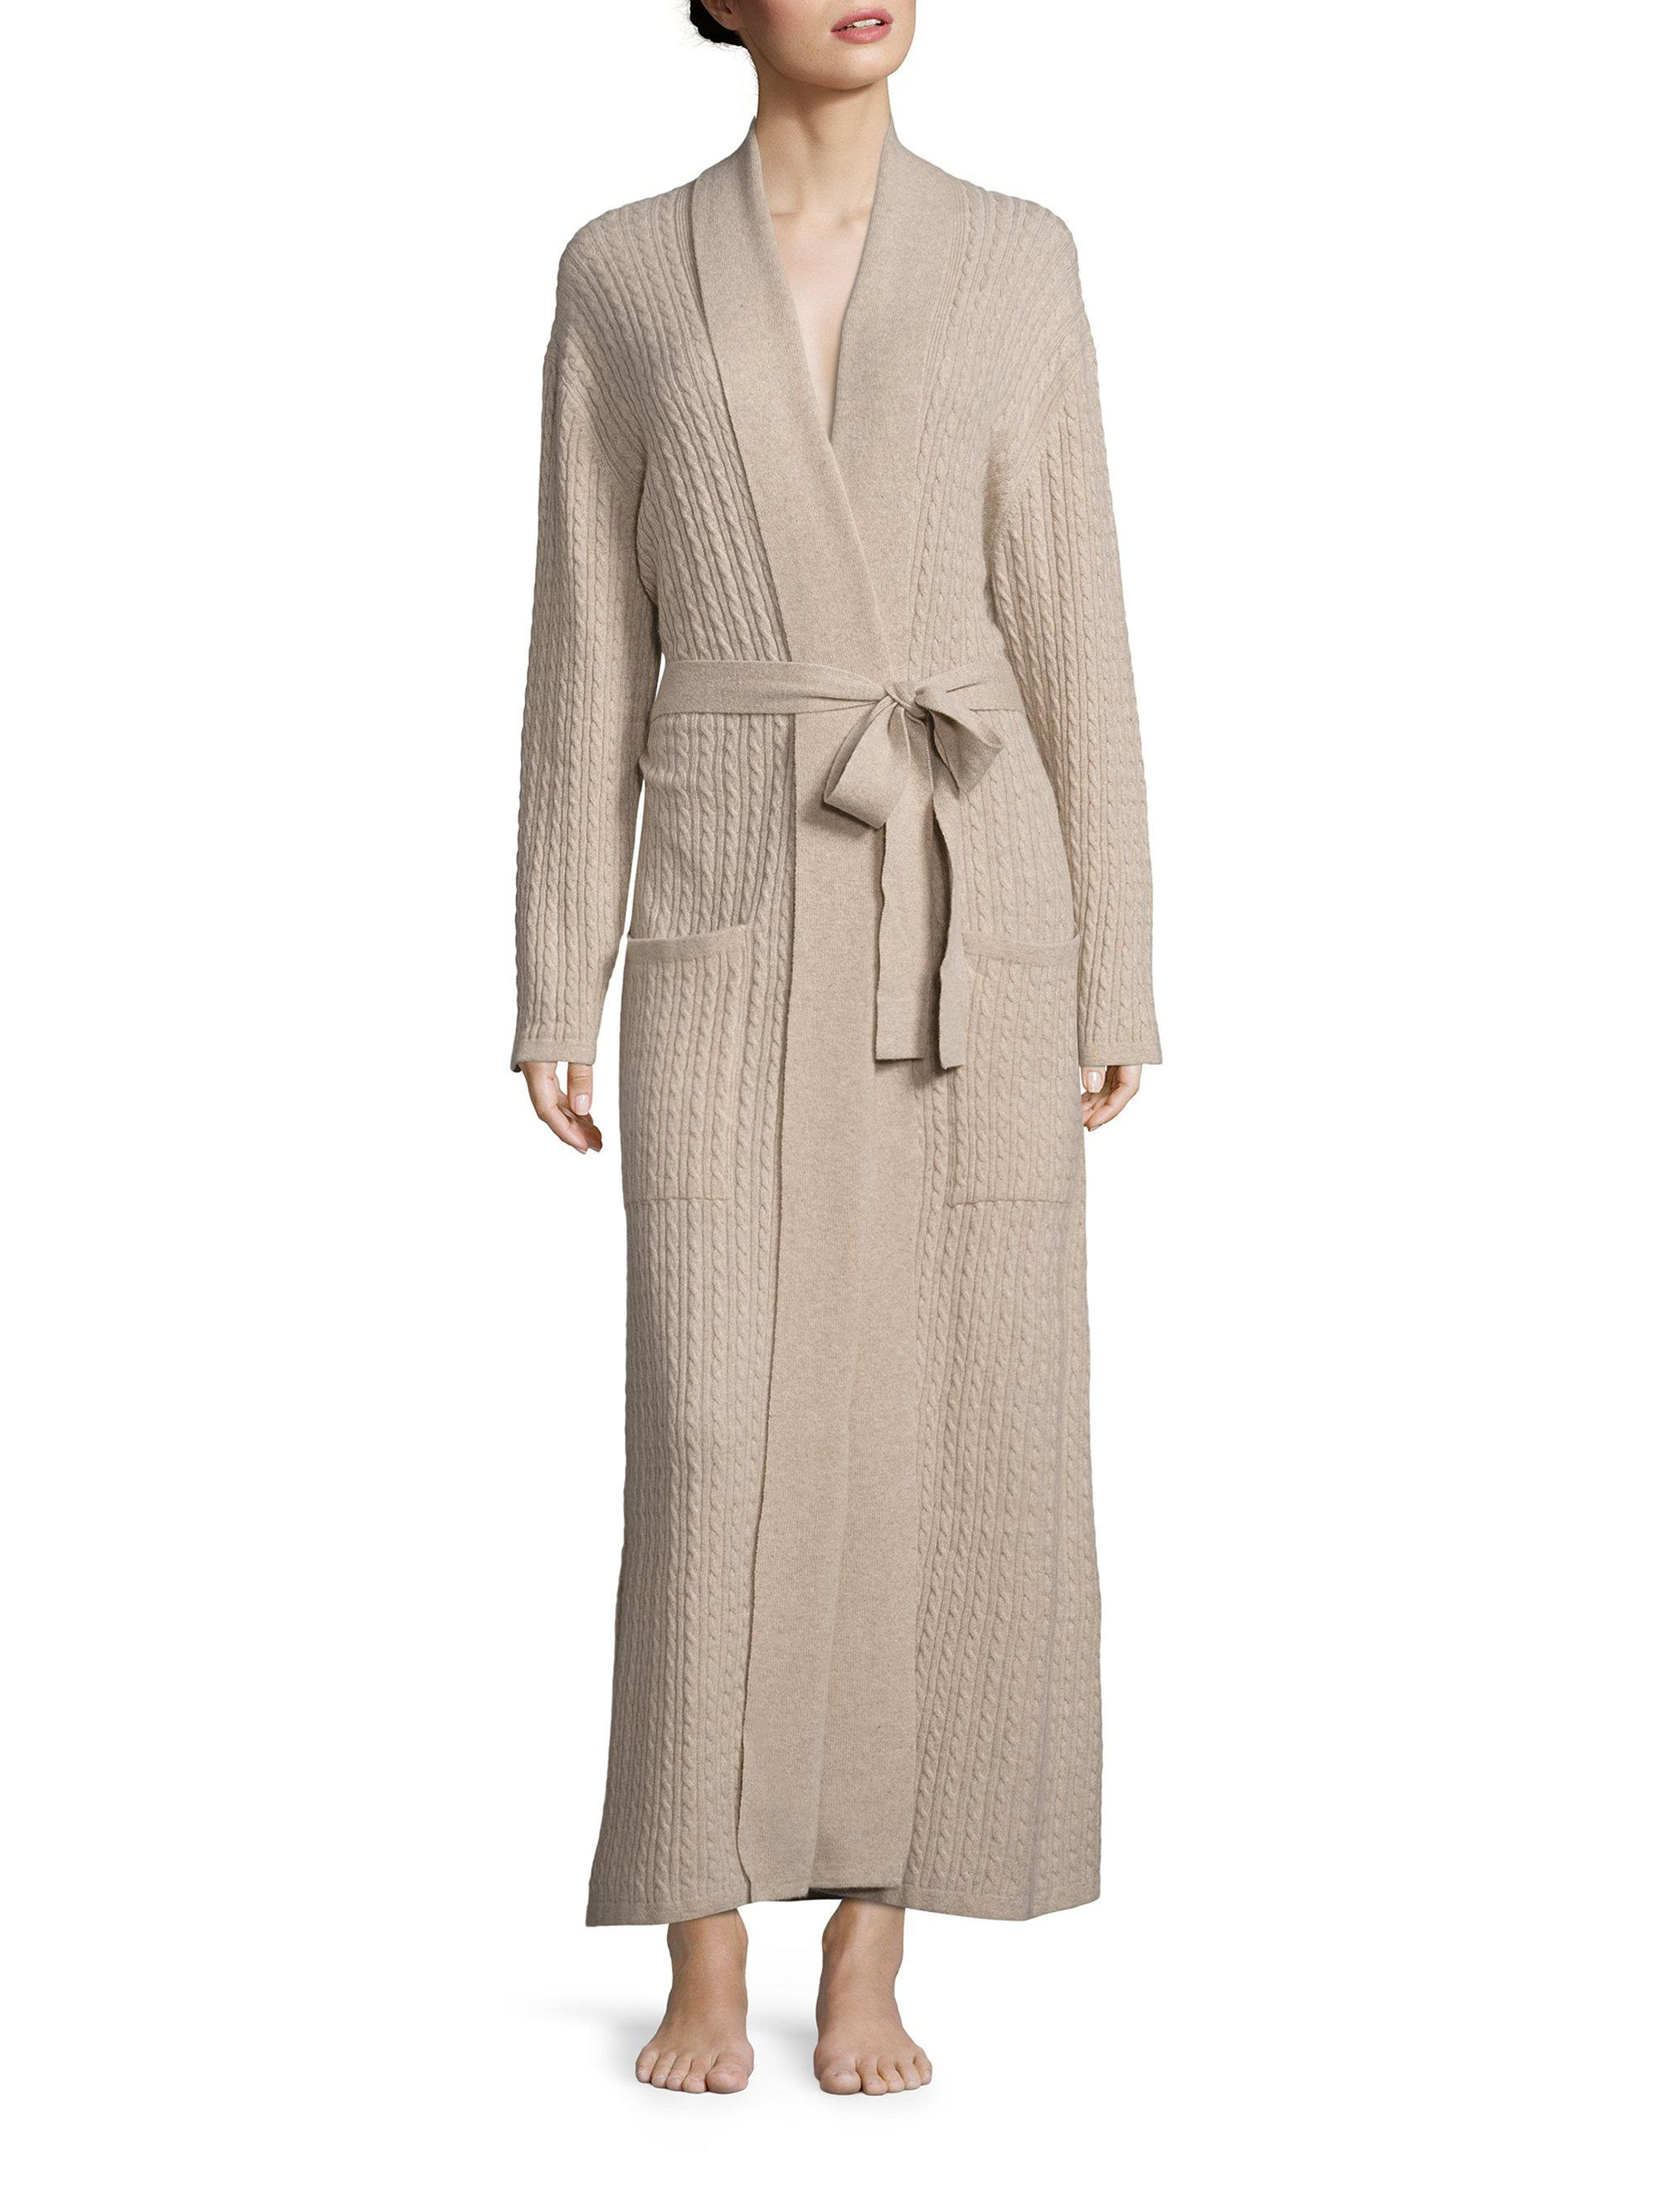 0d6641e80ff Arlotta By Chris Arlotta Women s Long Cable Cashmere Robe - Oatmeal ...